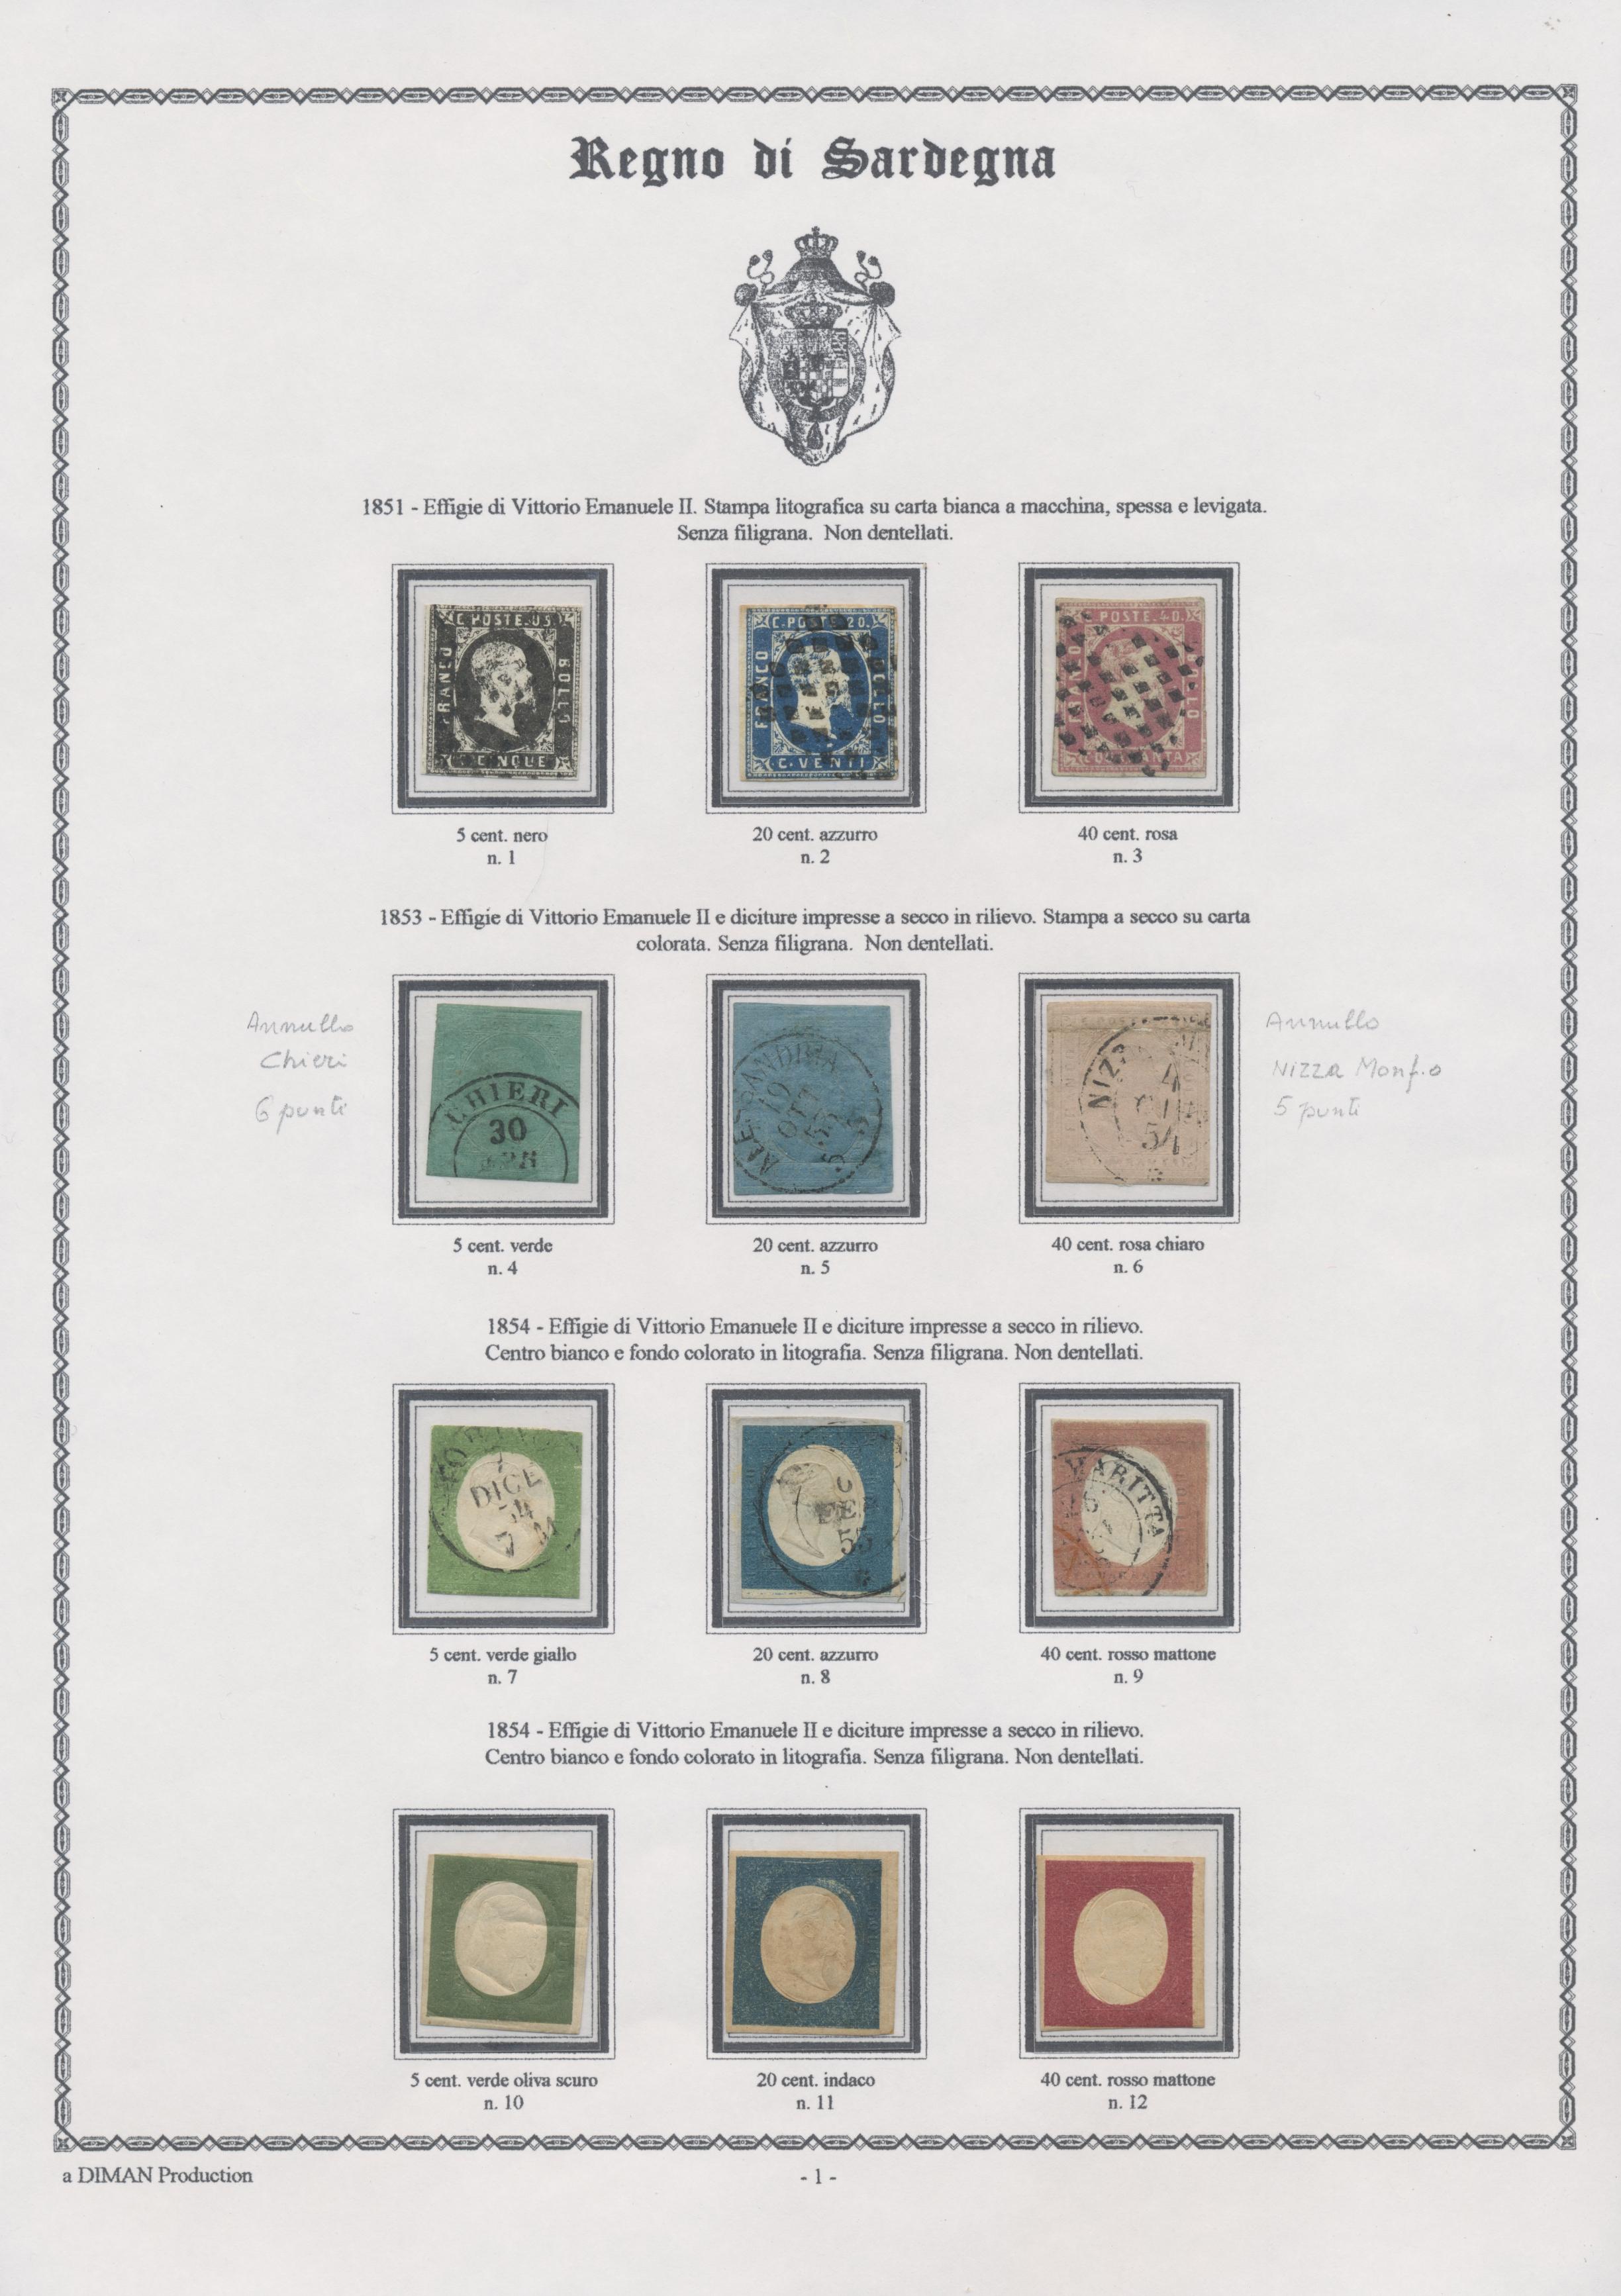 Colorati D Azzurro Chiaro stamp auction - italien - altitalienische staaten: sardinien